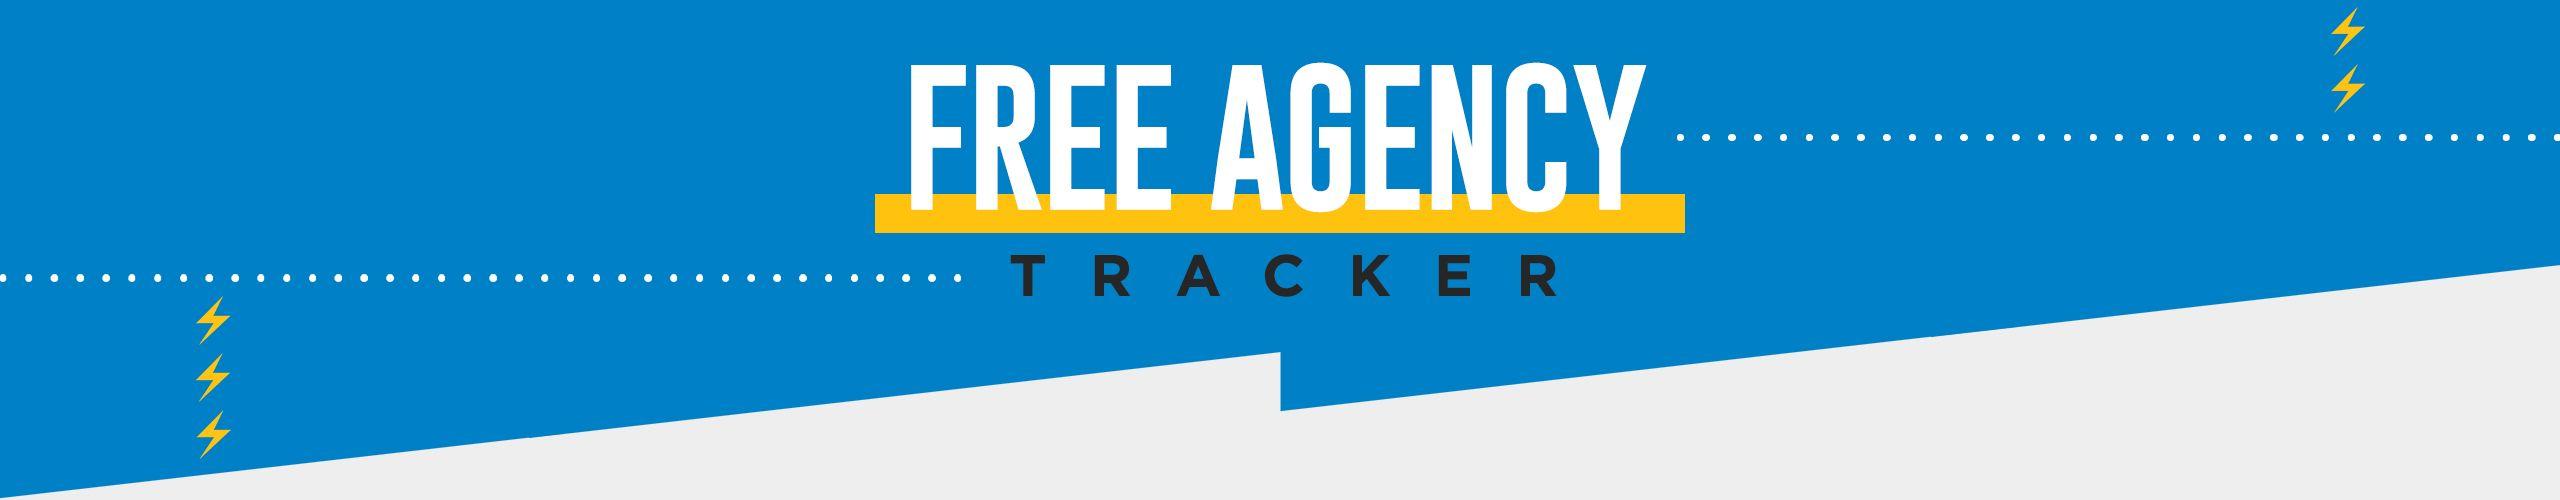 210114_Site_Free_agency_Tracker